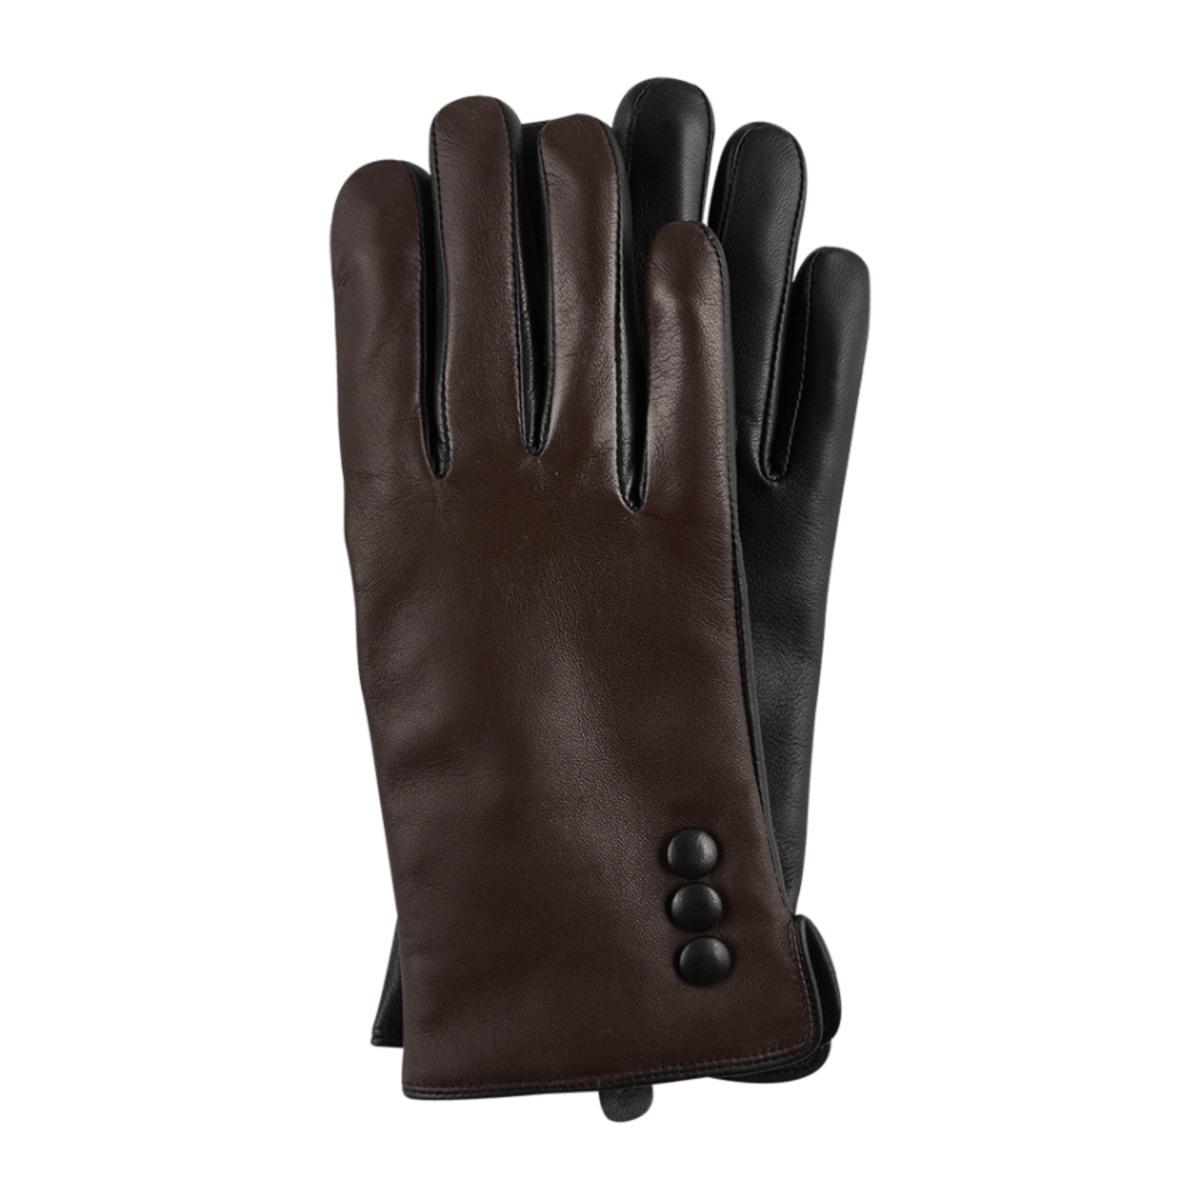 Bild 2 von ROYAL LIFE     Leder-Handschuhe